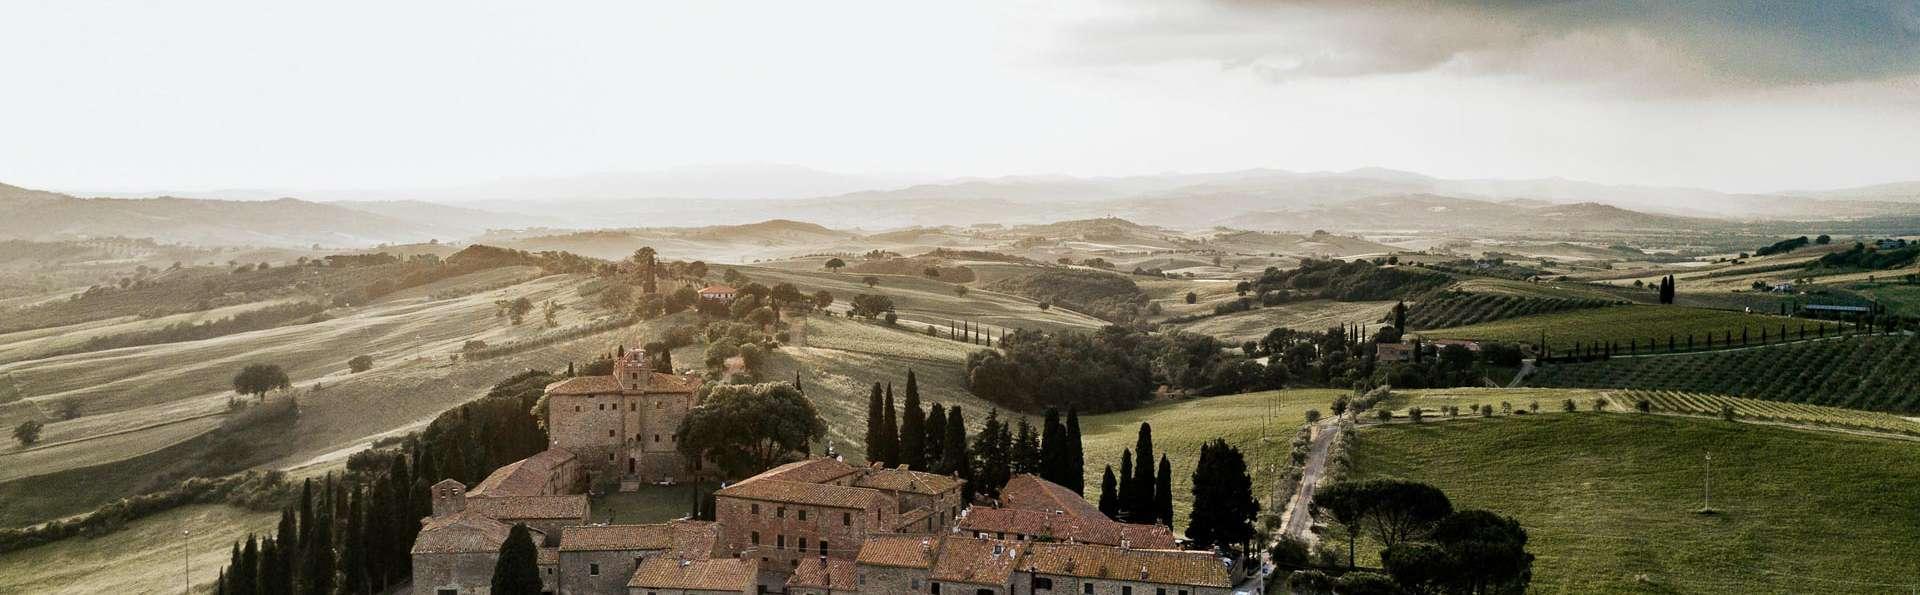 Castel Porrona Relais & Spa - EDIT_AERIAL_01.jpg